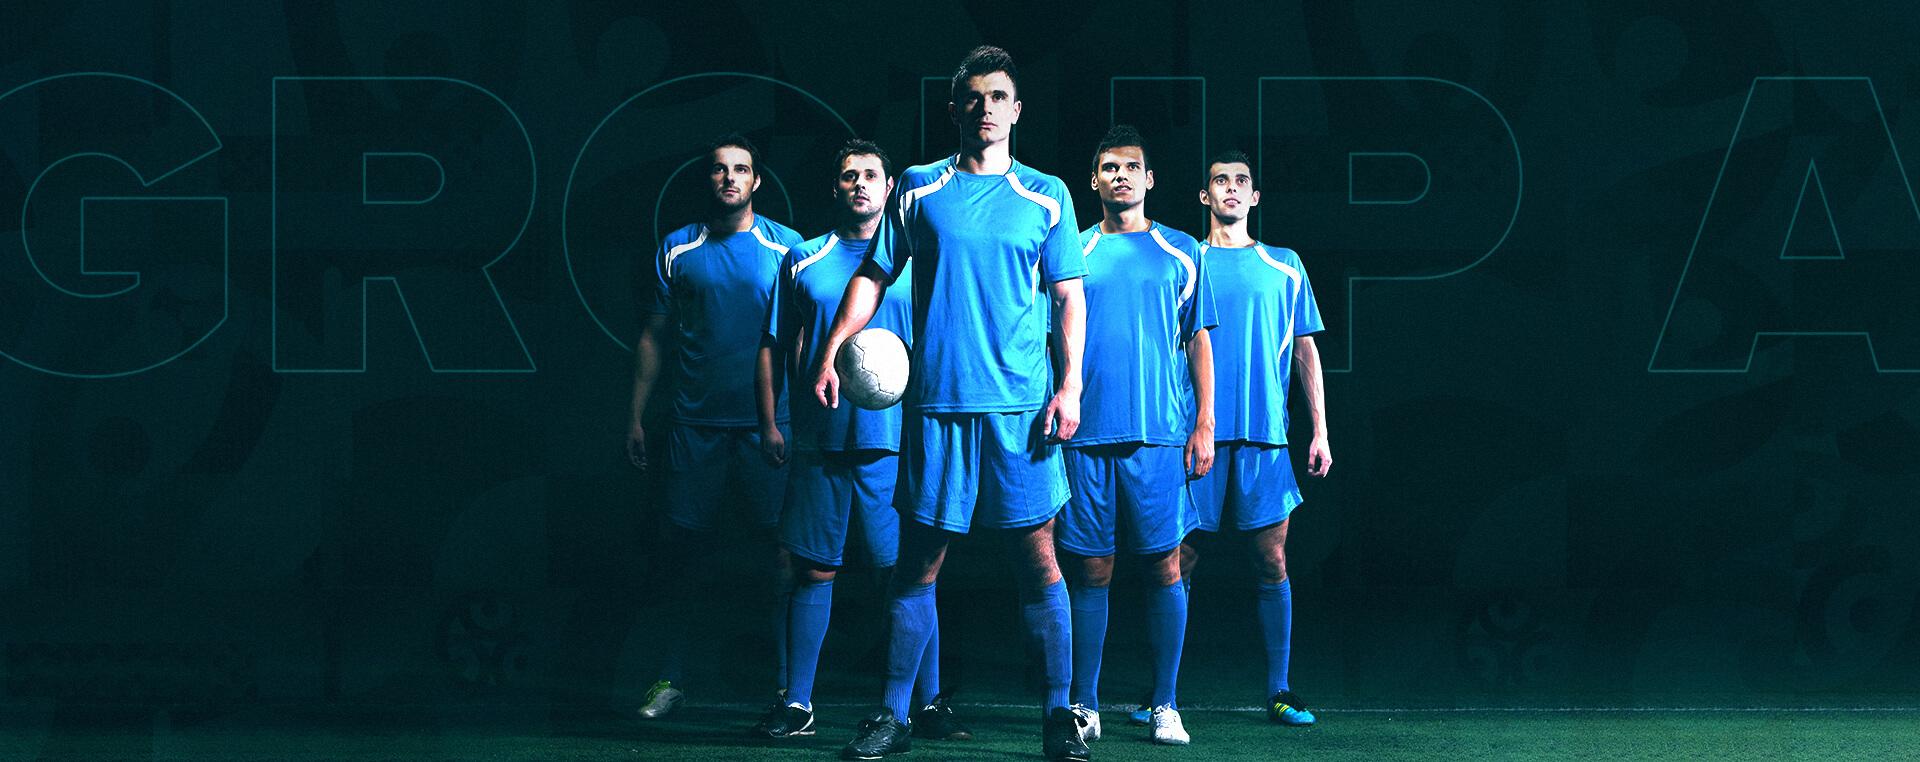 UEFA EURO 2020 (2021) – Group A